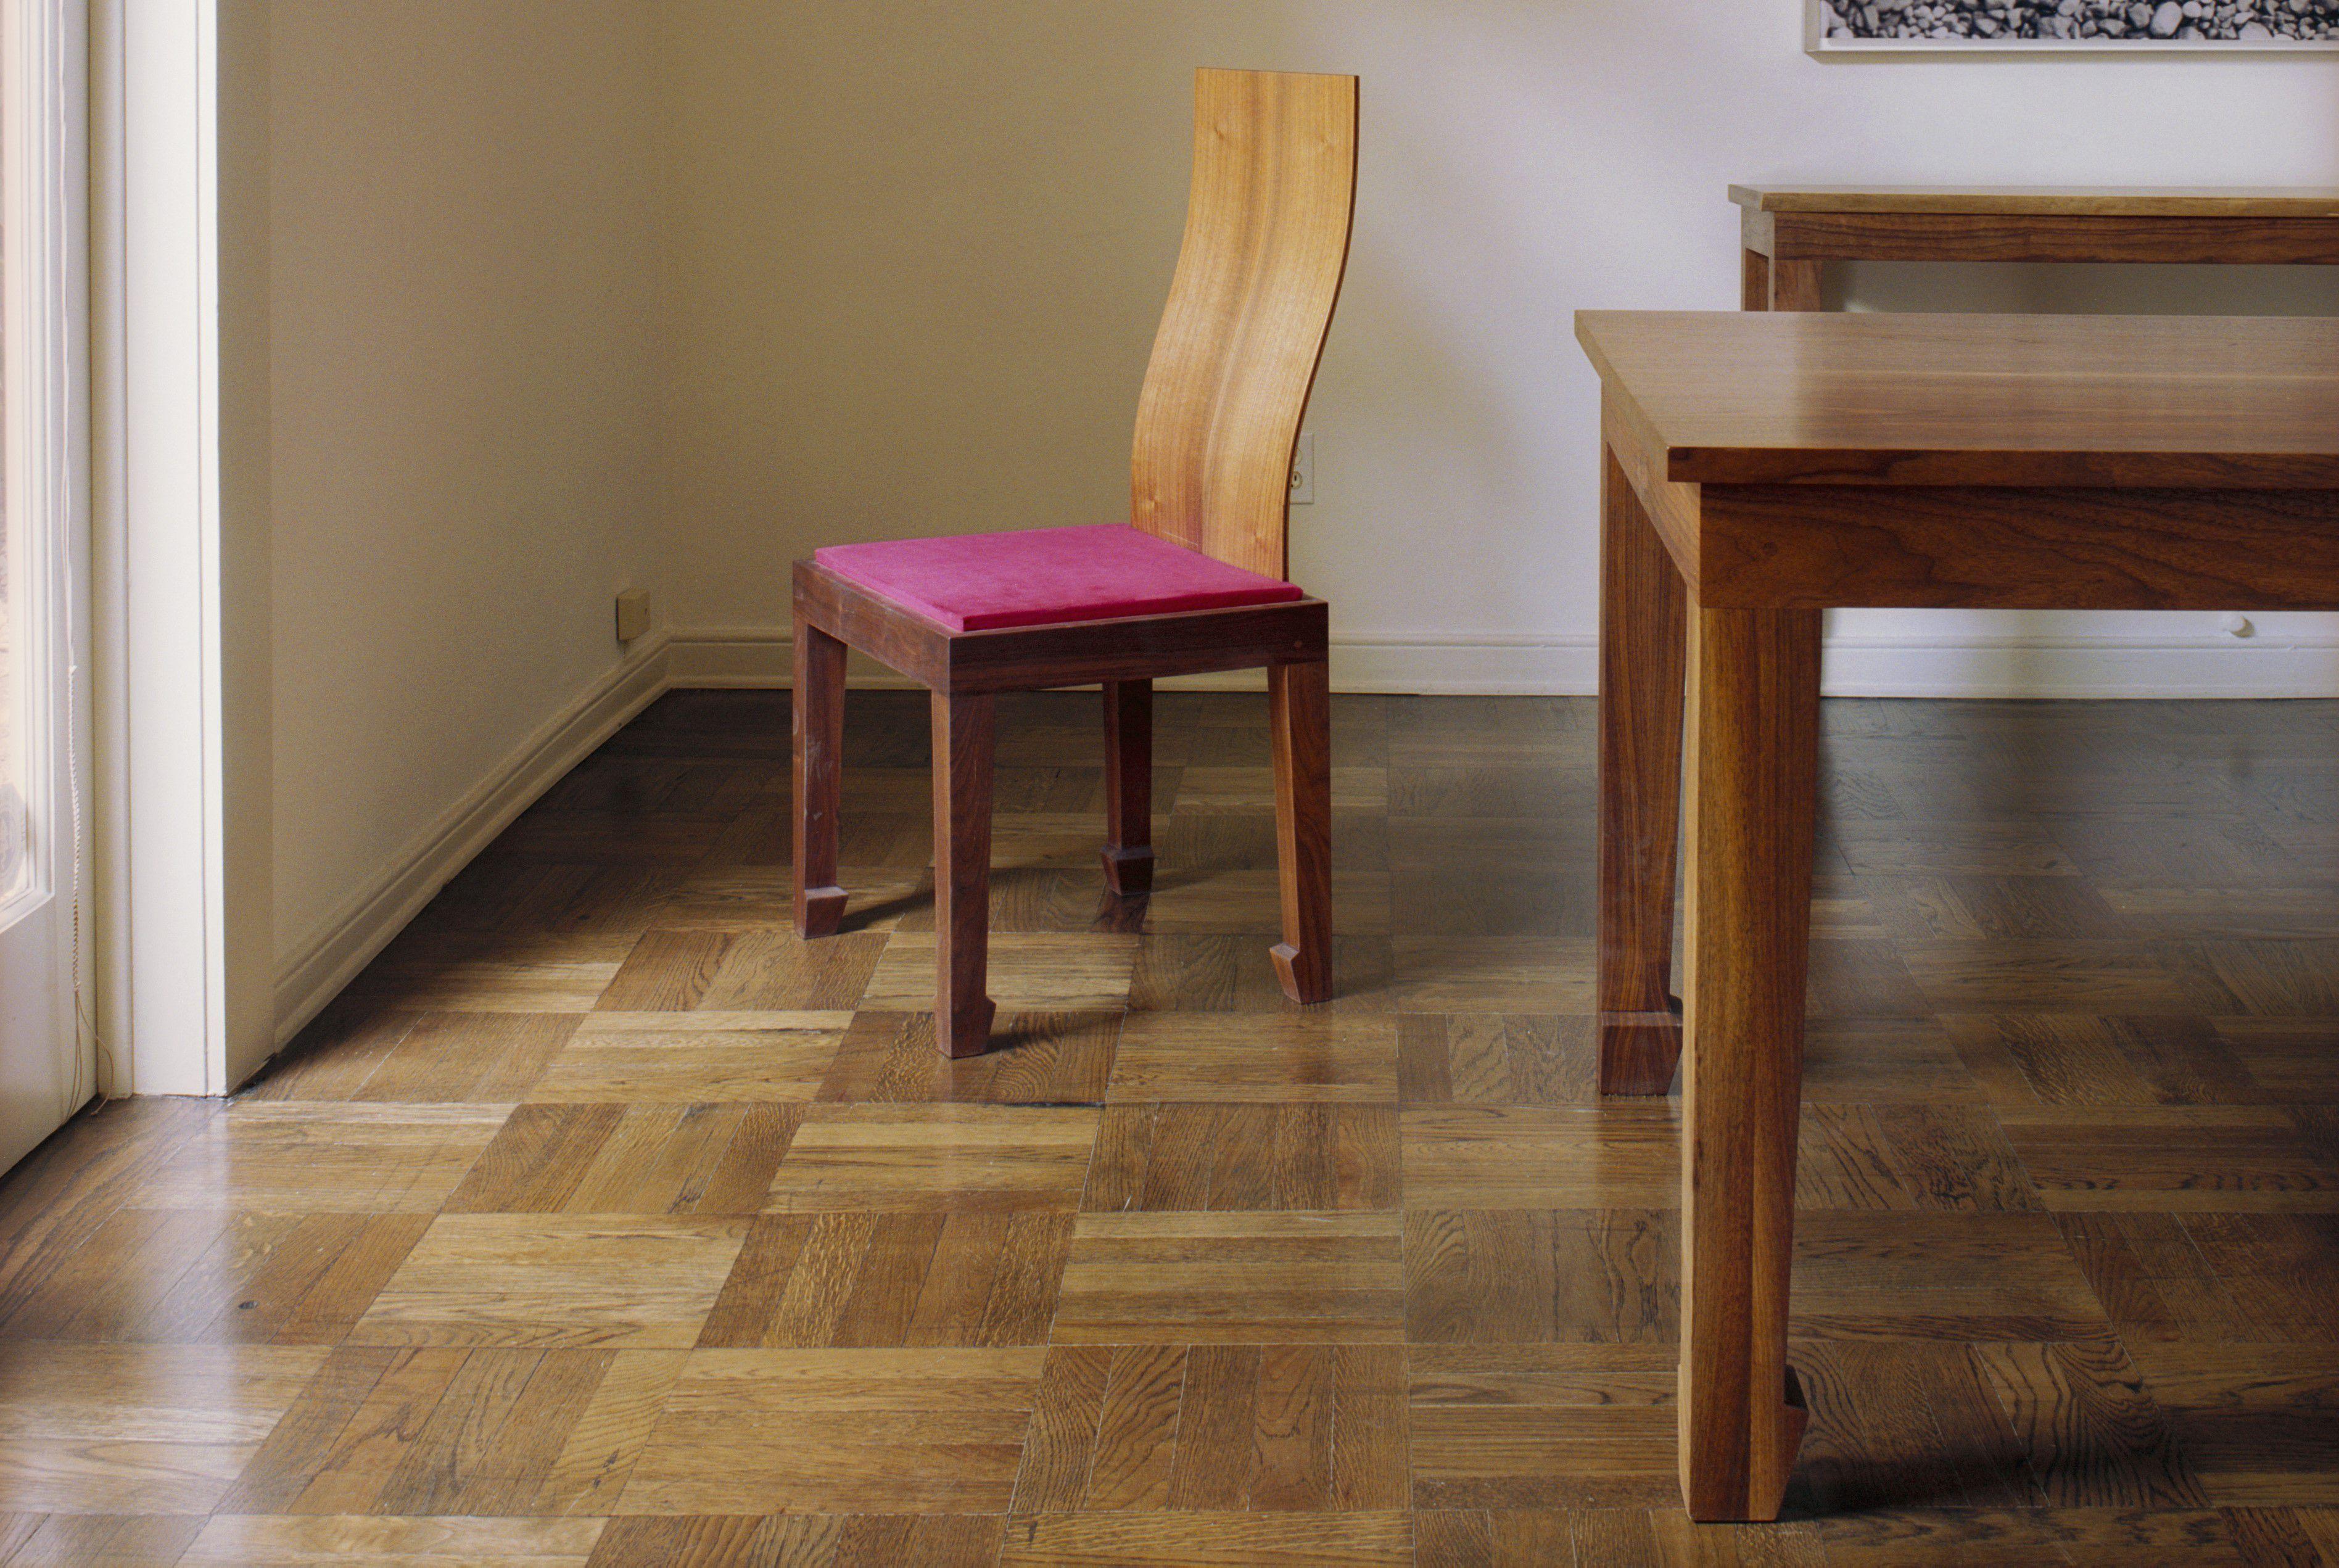 staining hardwood floors lighter of wood parquet flooring poised for a resurgence intended for wood parquet flooring 529502452 576c78195f9b585875a1ac13